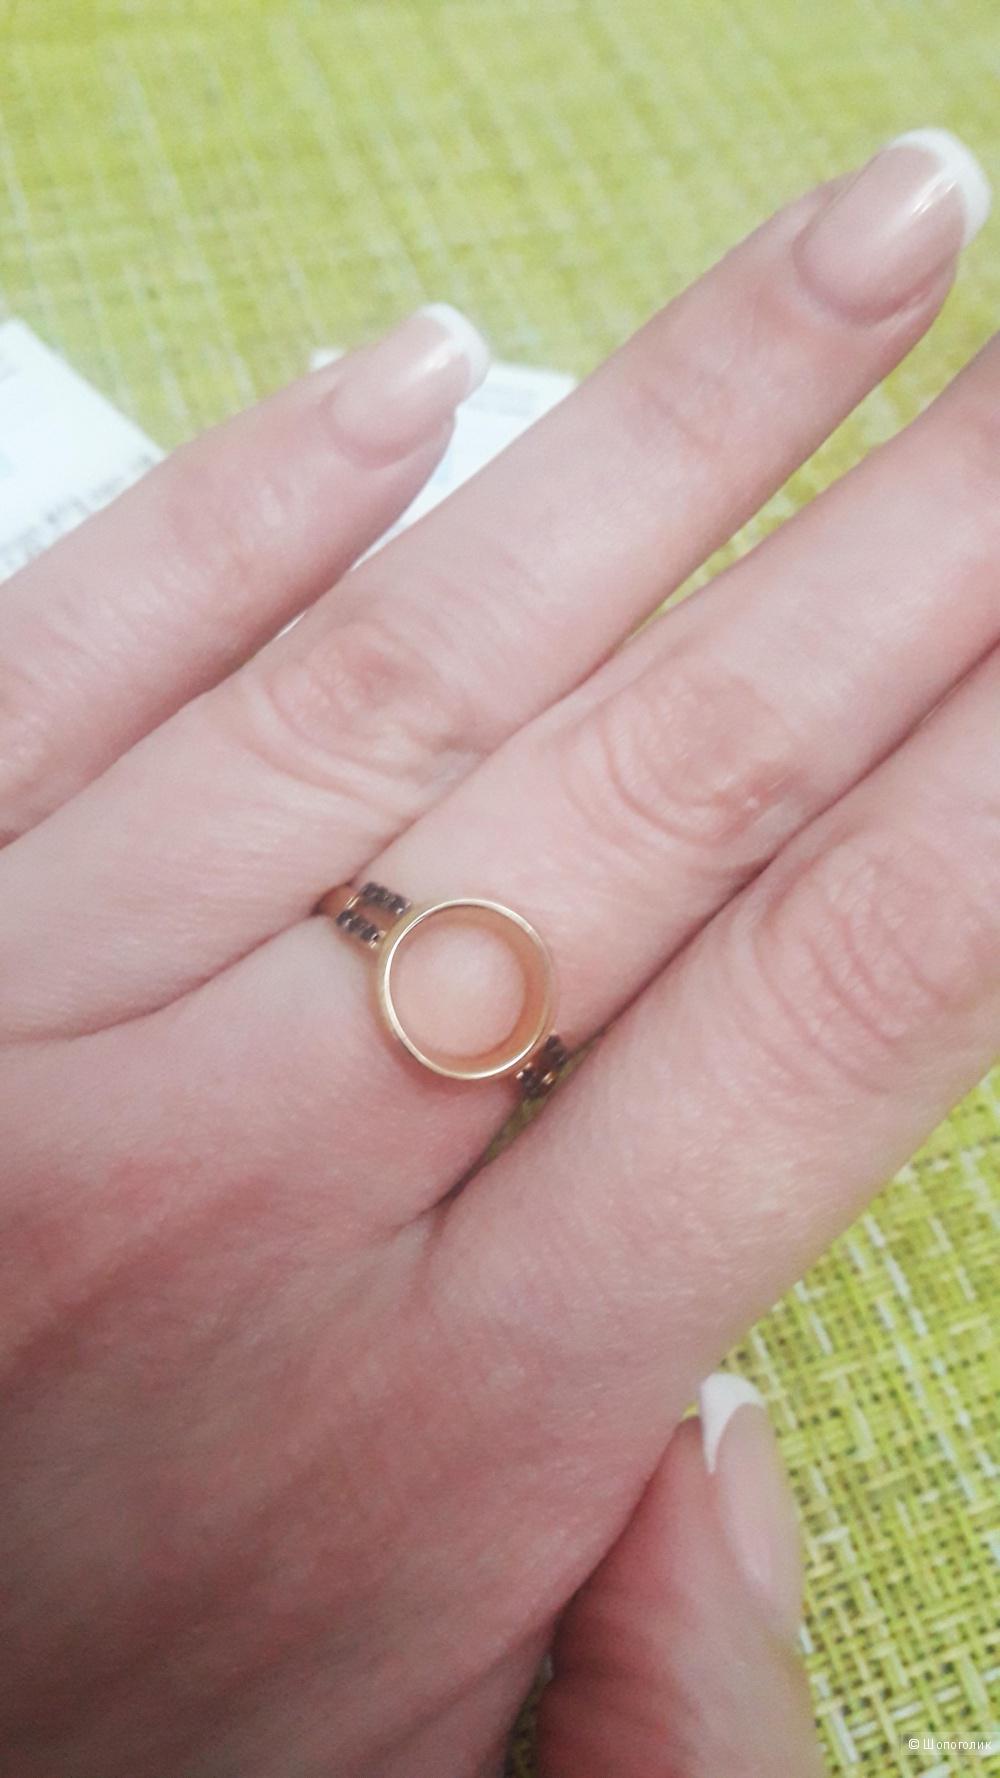 Набор серьги и кольцо 17 размер. Серебро.